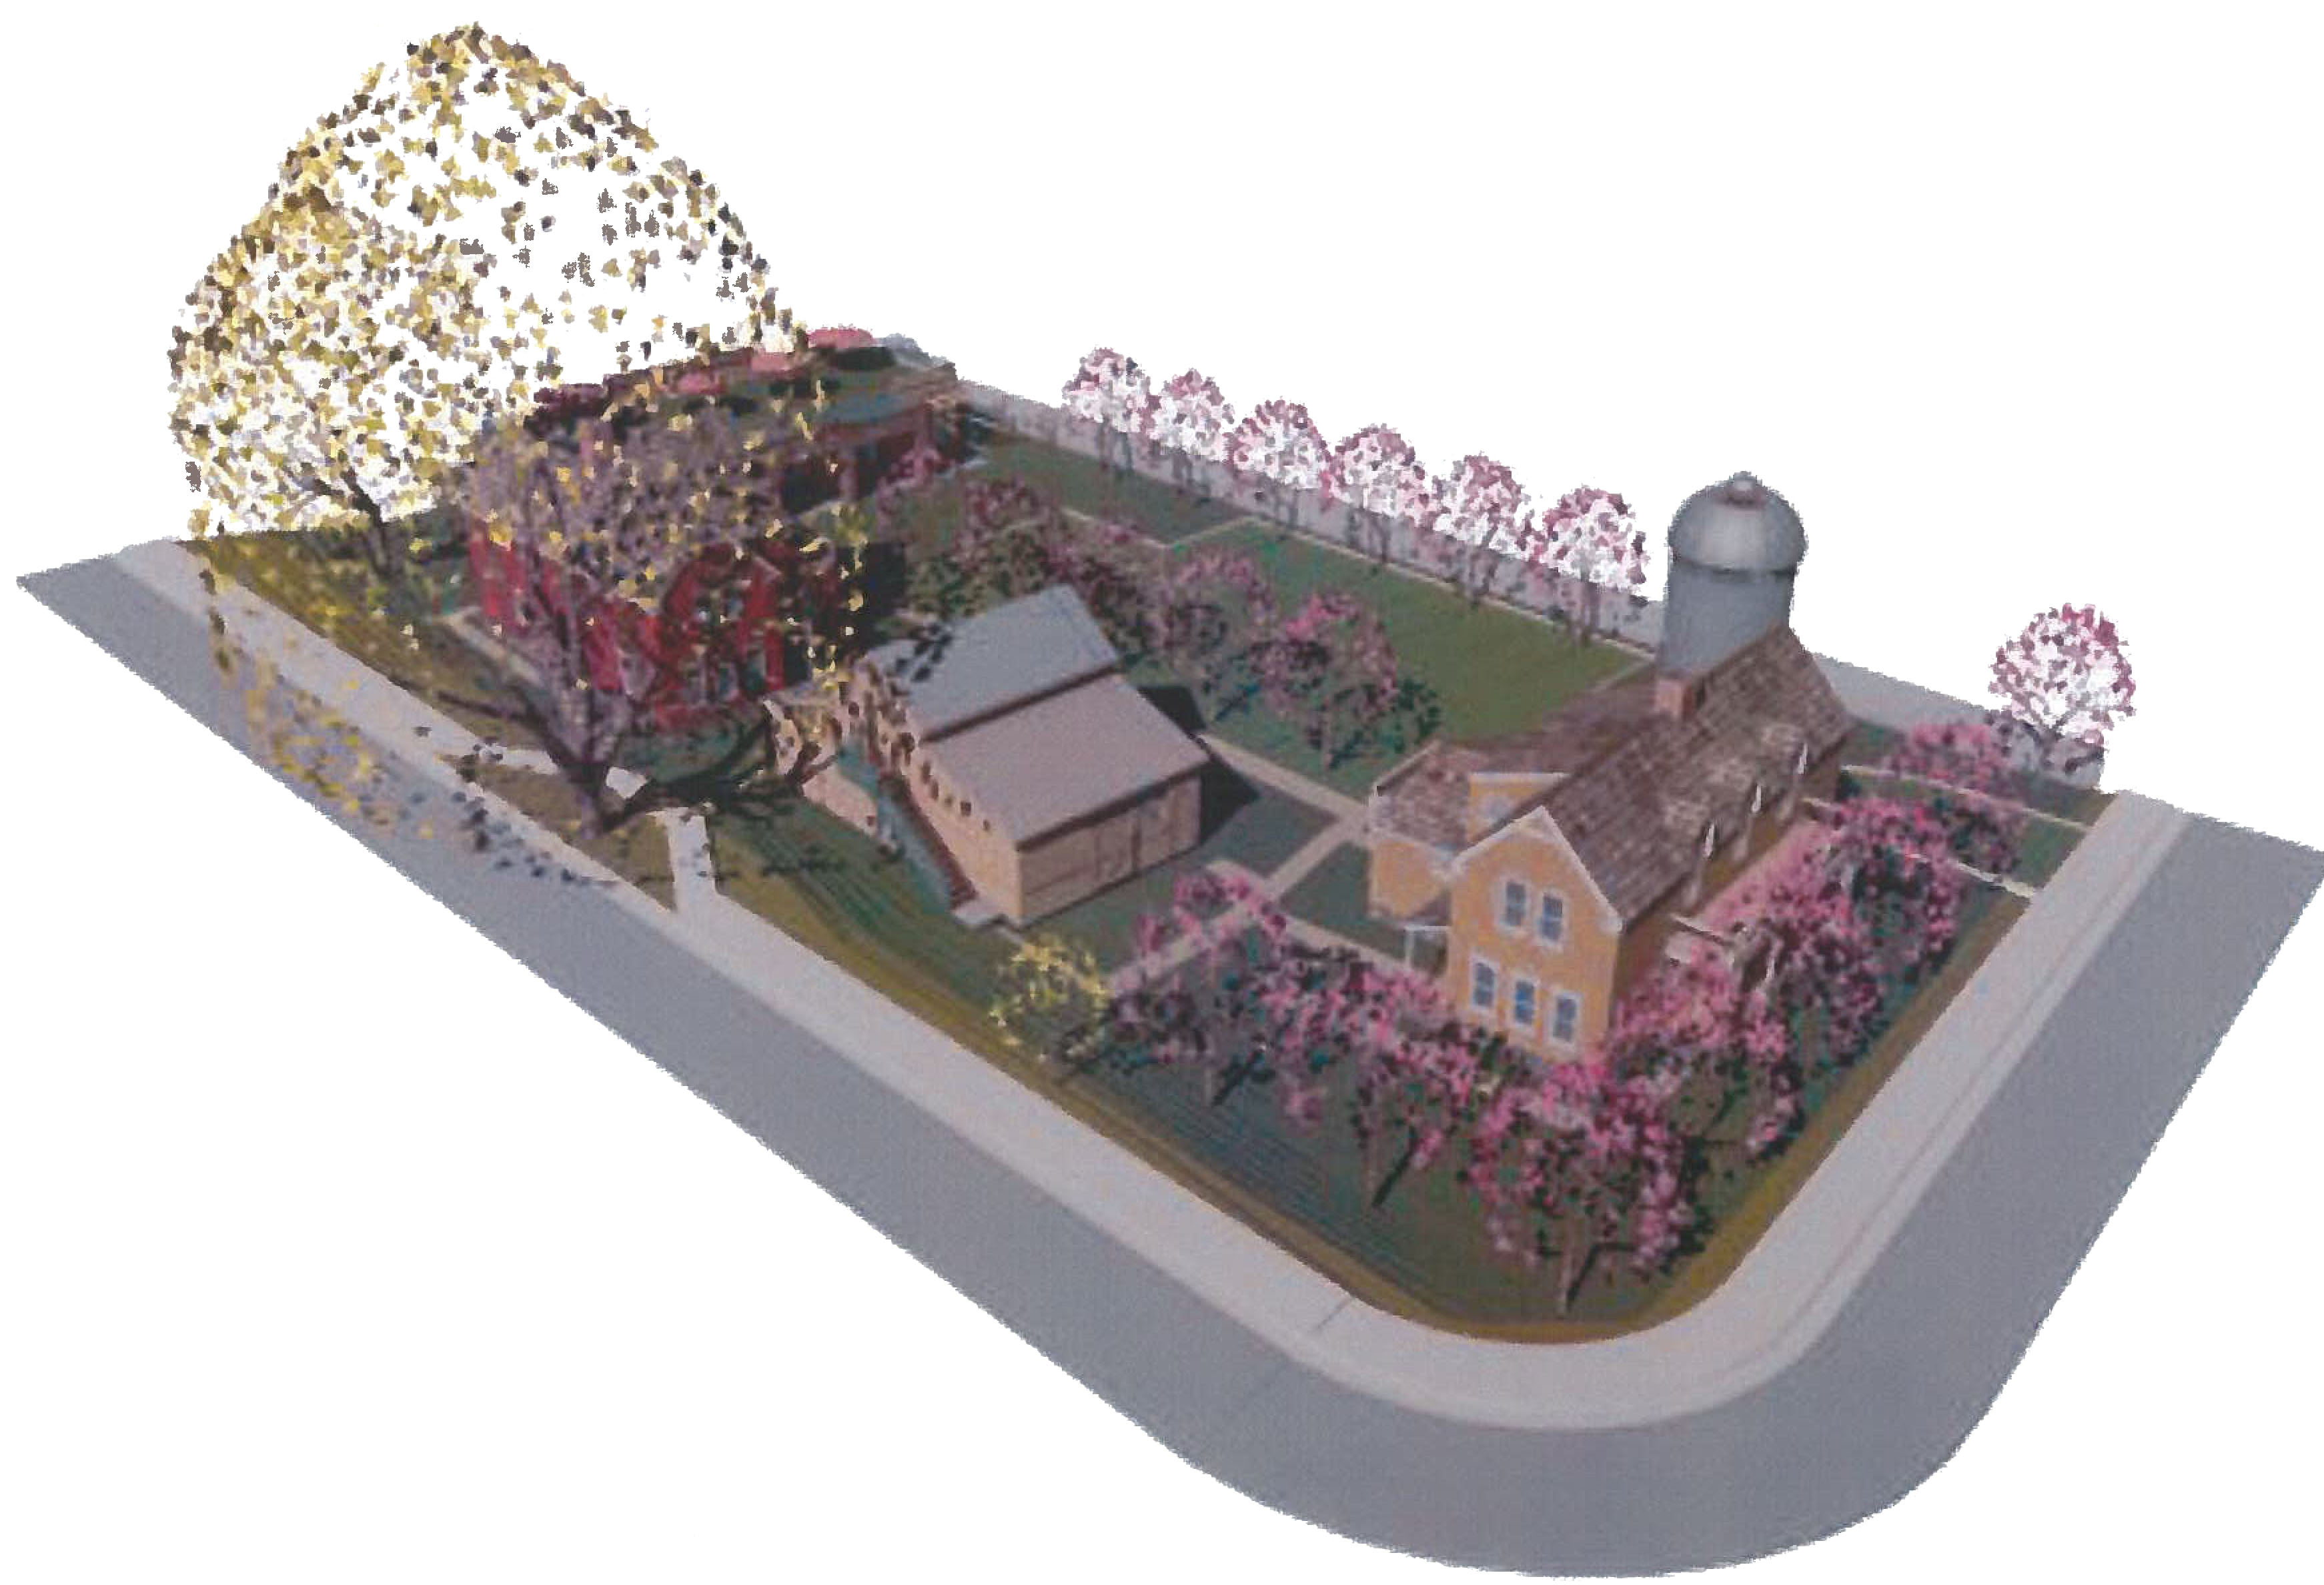 Architectural drawing of a proposed inn in Santa Clara   Image courtesy of Santa Clara City